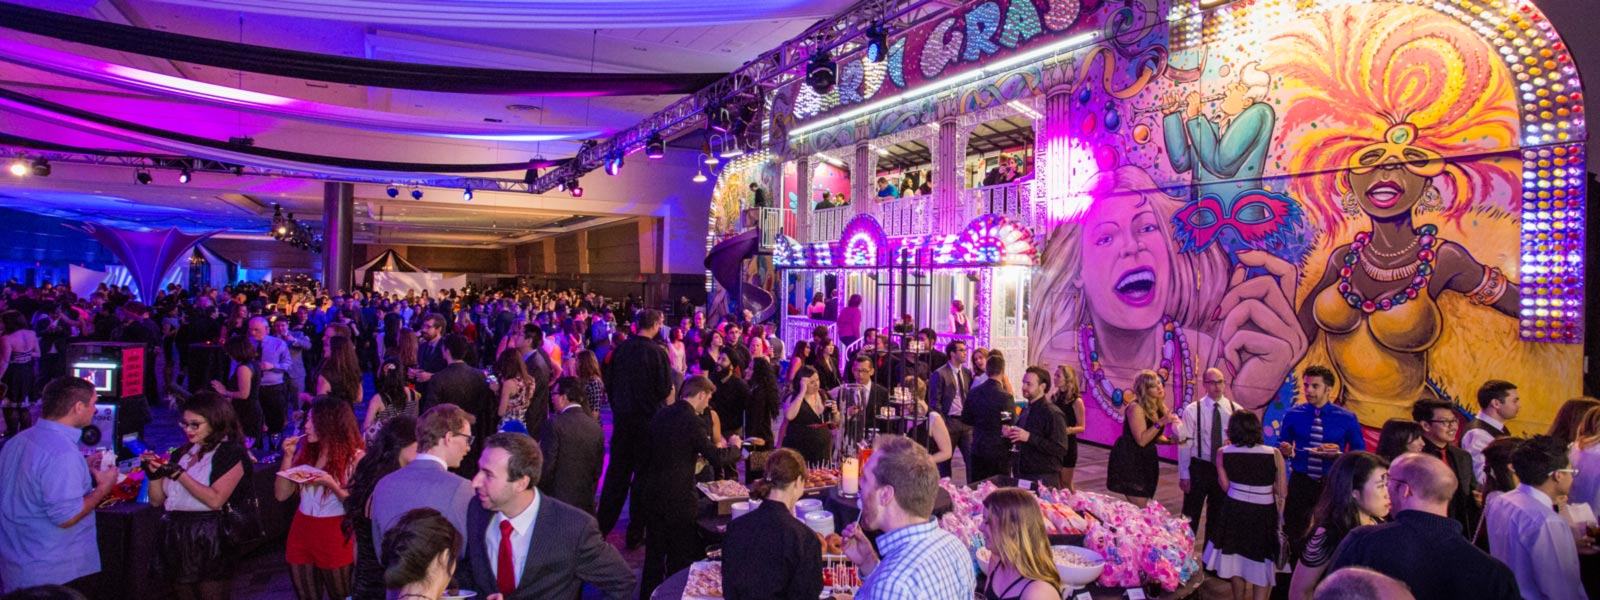 Corporate event photo for EA Cirque night